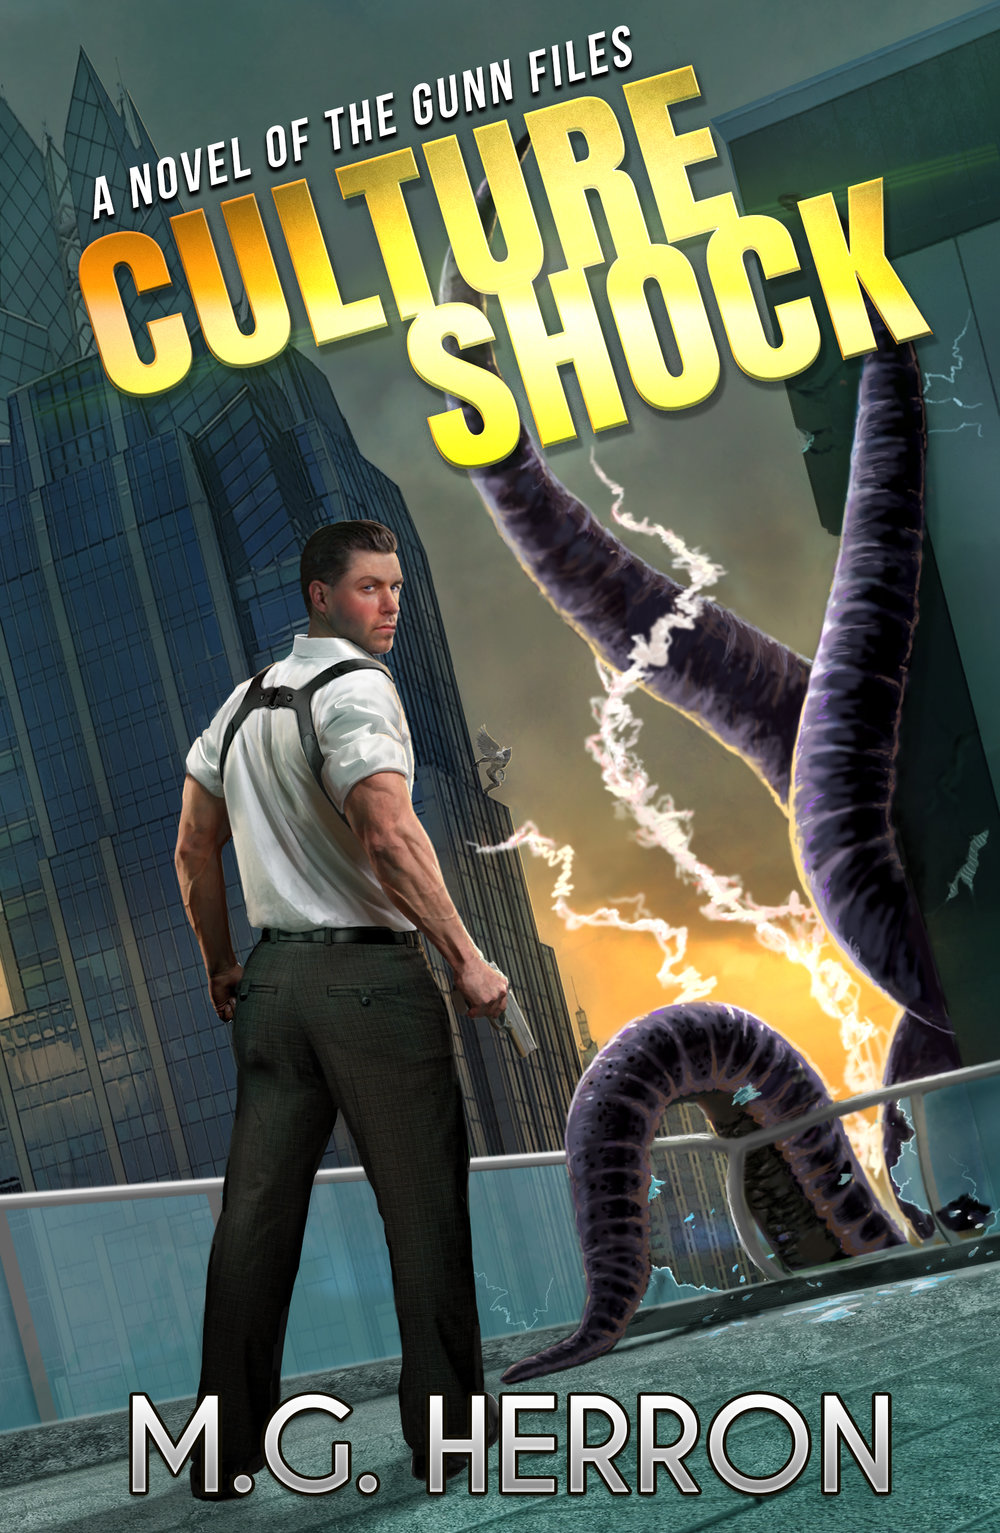 CultureShock Cover.jpg